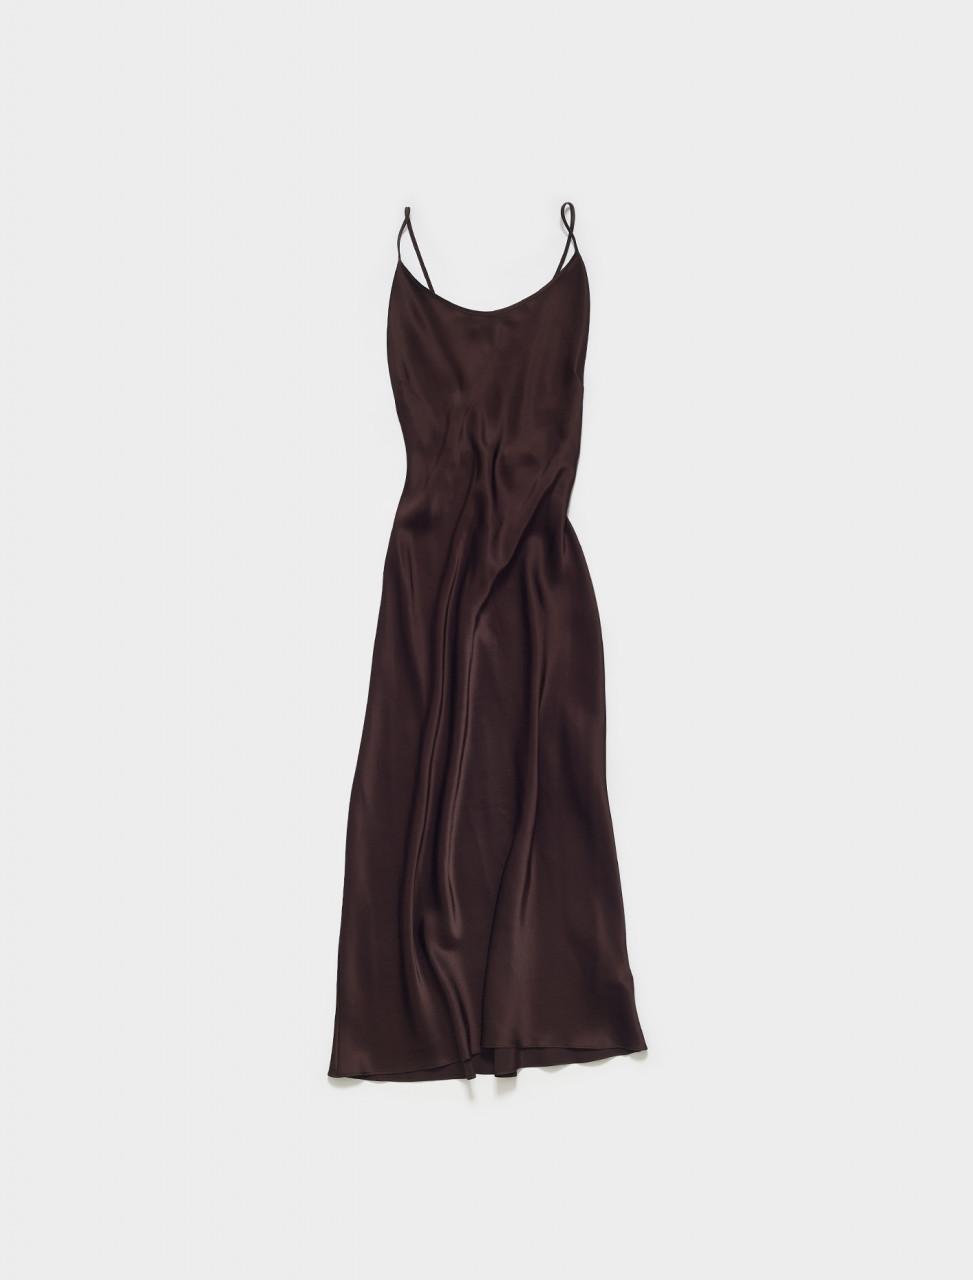 332-3053-DC PRISCAVERA OPEN BACK KEYHOLE DRESS IN DARK CHERRY